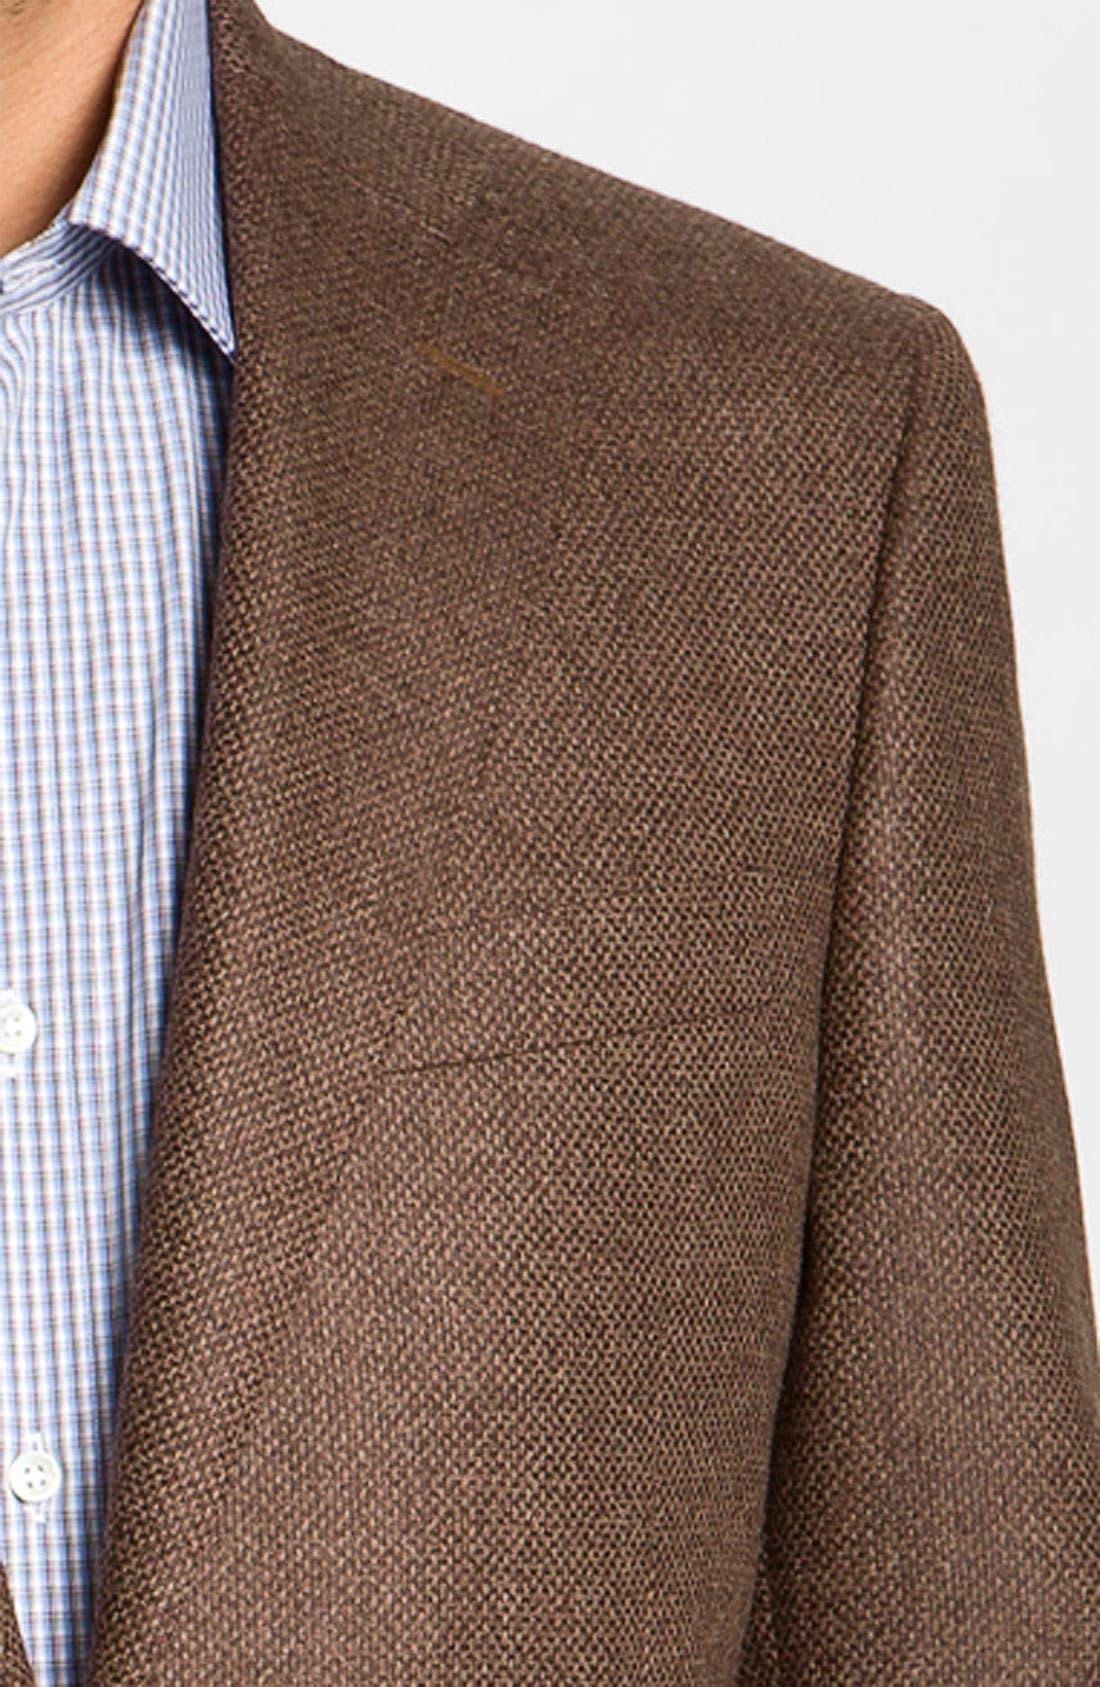 Alternate Image 3  - Canali Wool Blend Sportcoat